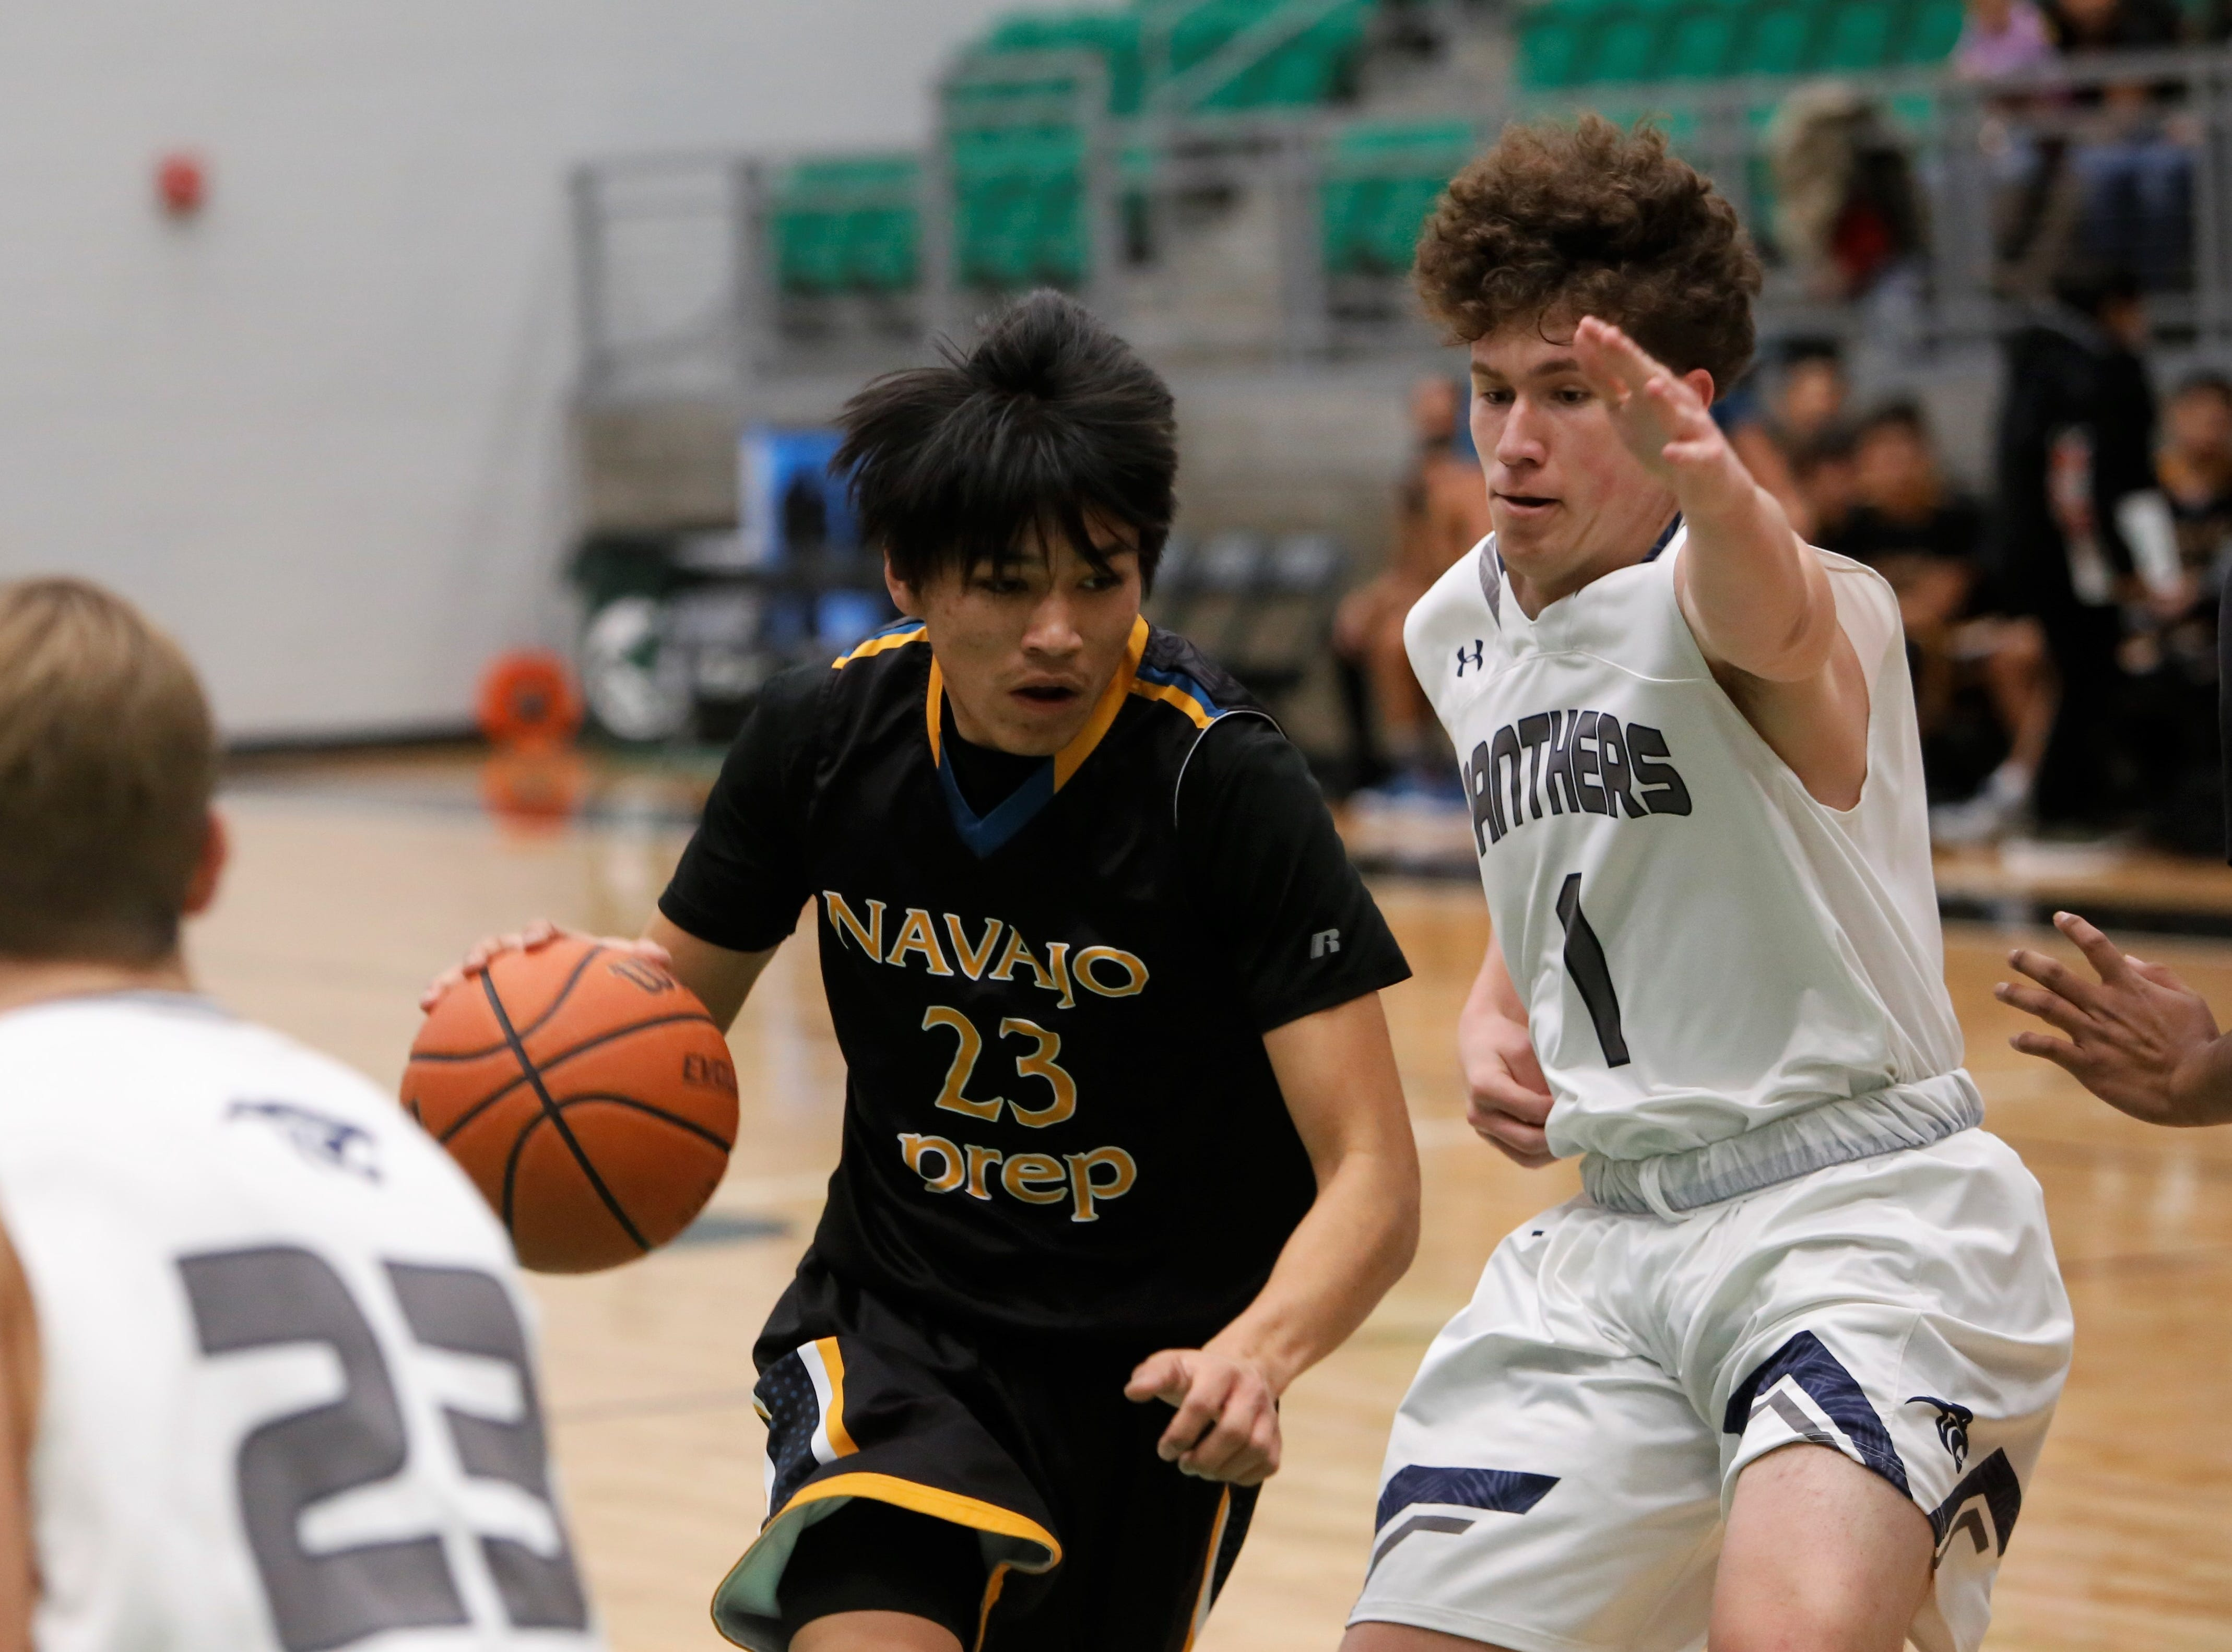 Navajo Prep's Trejan Clichee attacks the basket against Piedra Vista's Jalen Woods during the Marv Sanders Invitational quarterfinals Thursday at Scorpion Arena in Farmington.